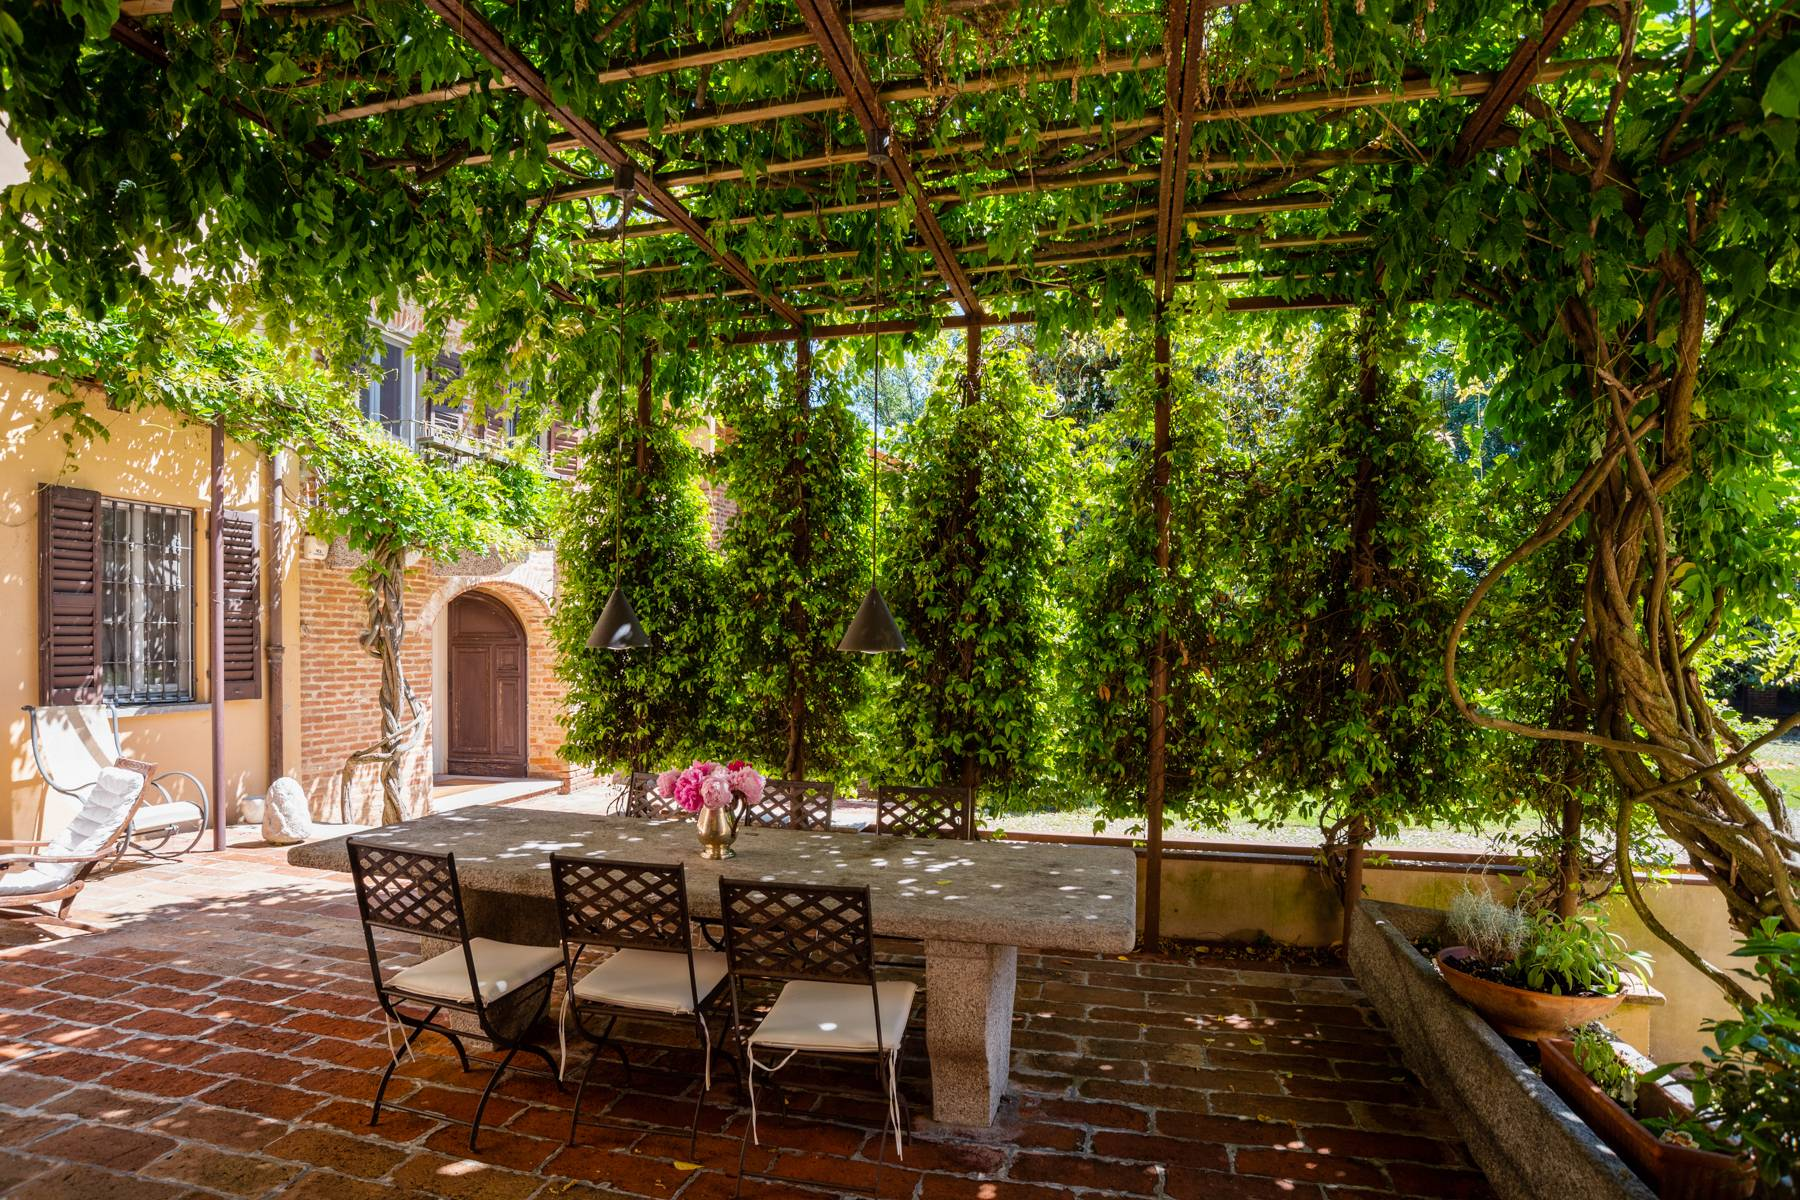 Magnifica proprietà immersa nel verde a Pavia - 3